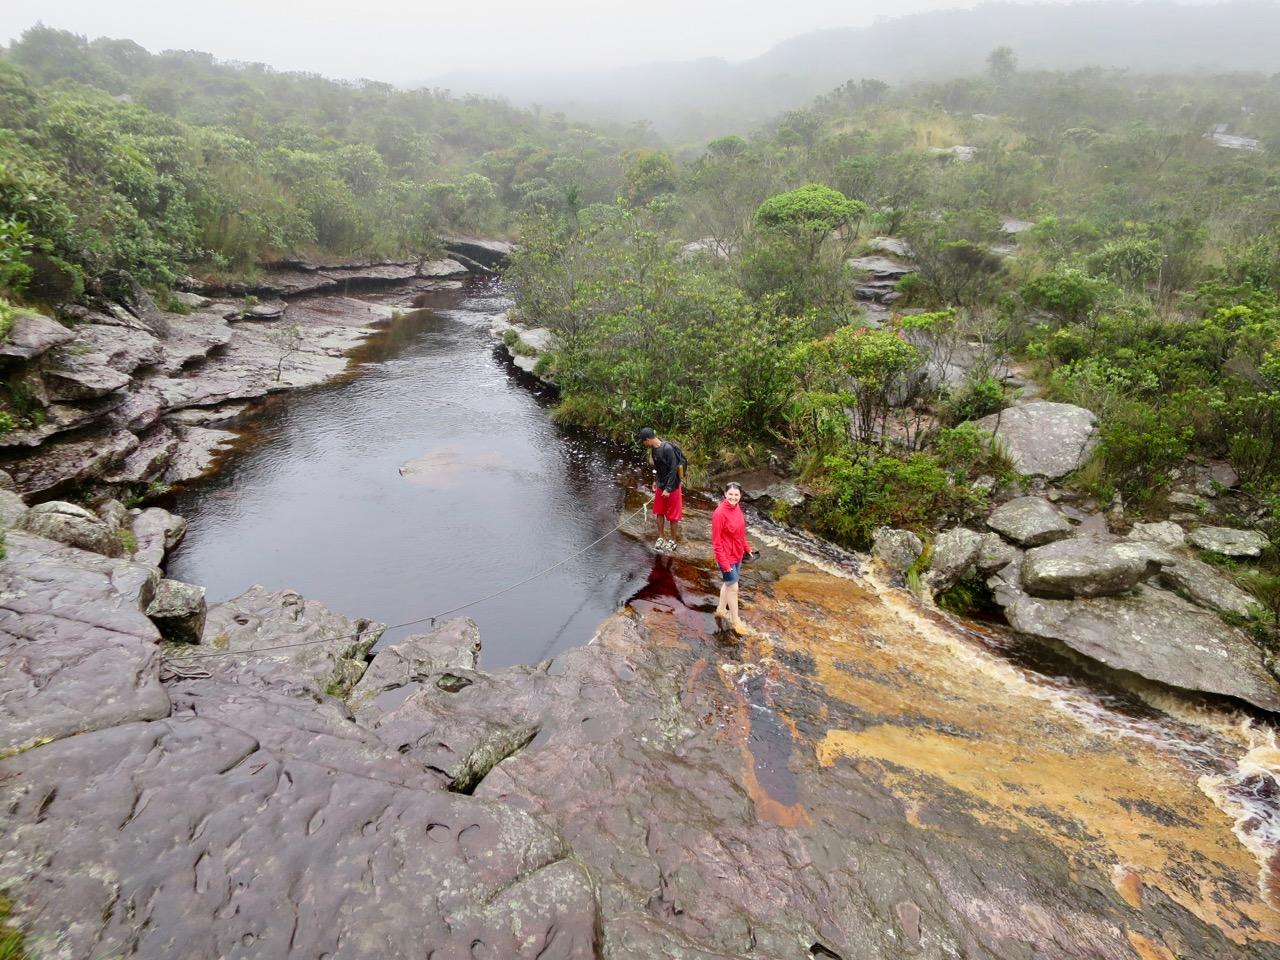 Cachoeira da Fumaca 1 14b